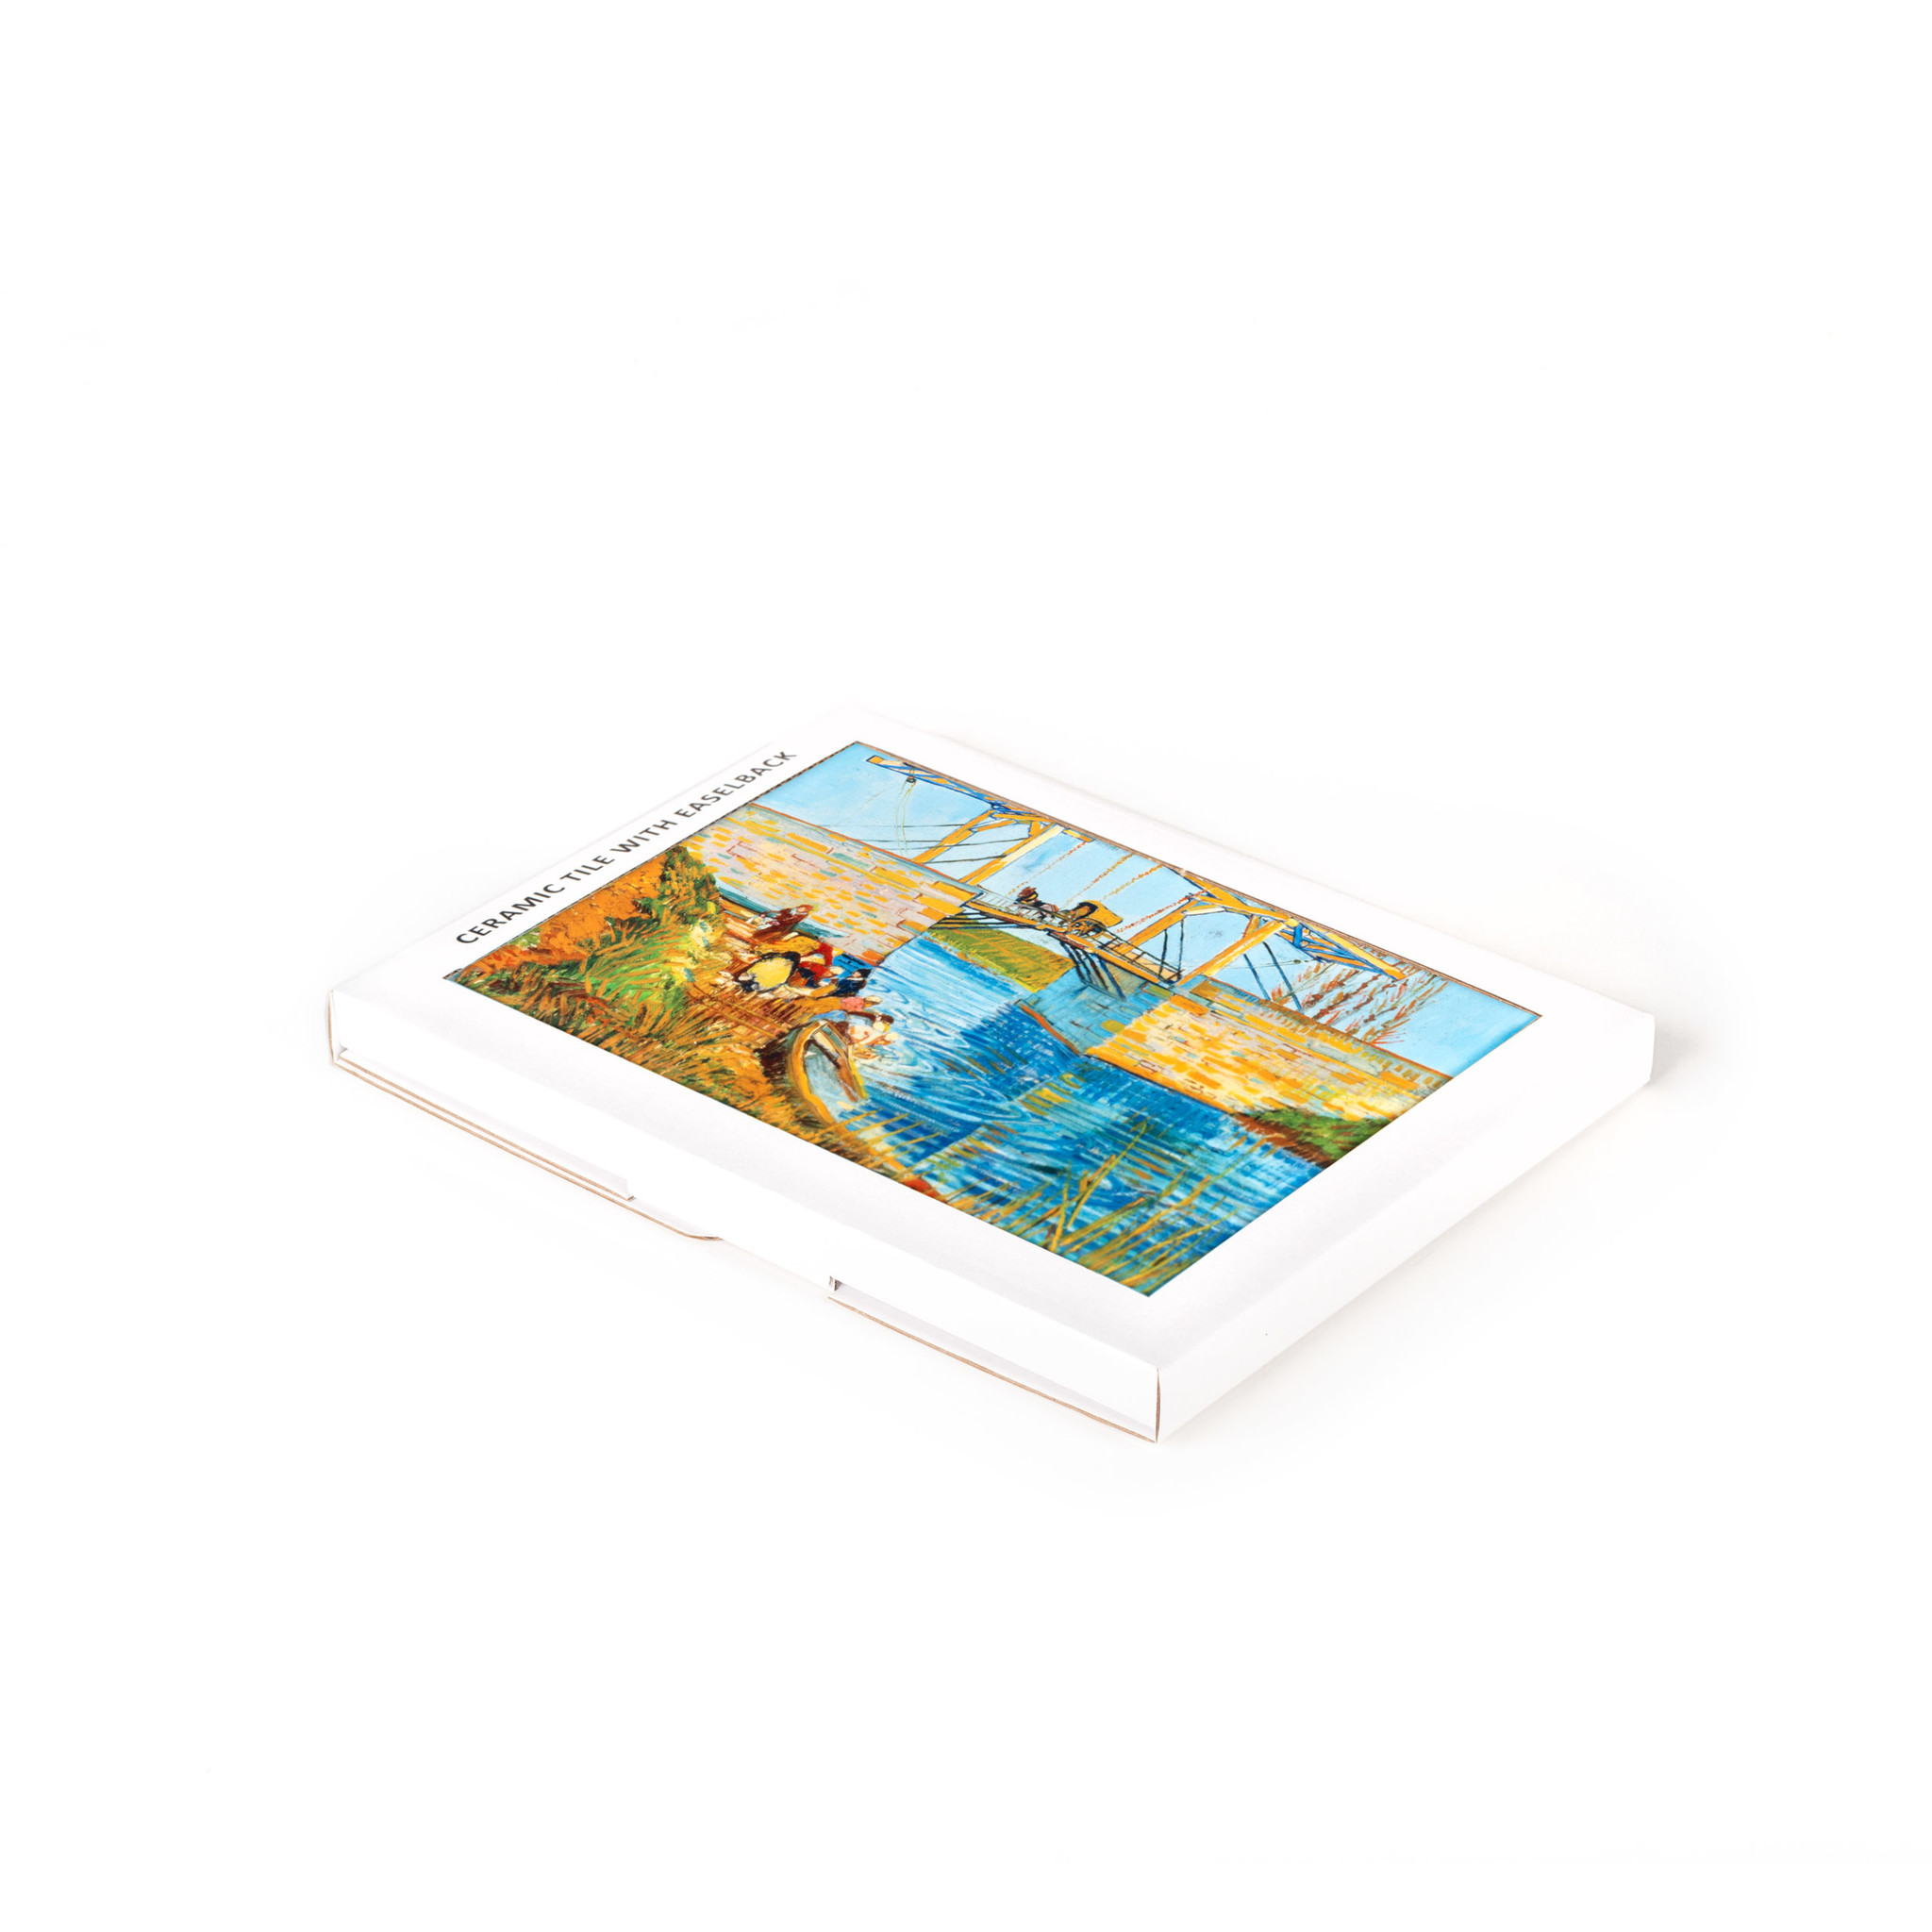 Keramische tegel Van Gogh Brug te Arles